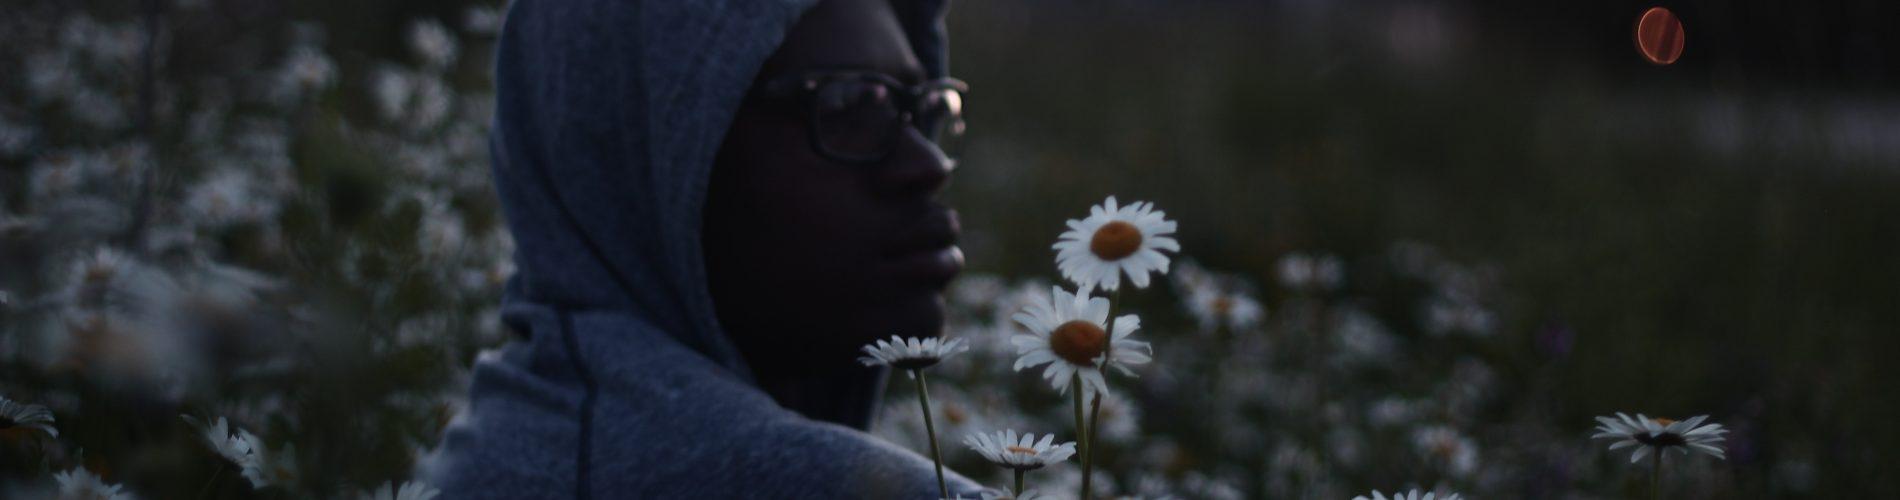 Caring Masculinity, Flower Man, wellington sanipe unsplash